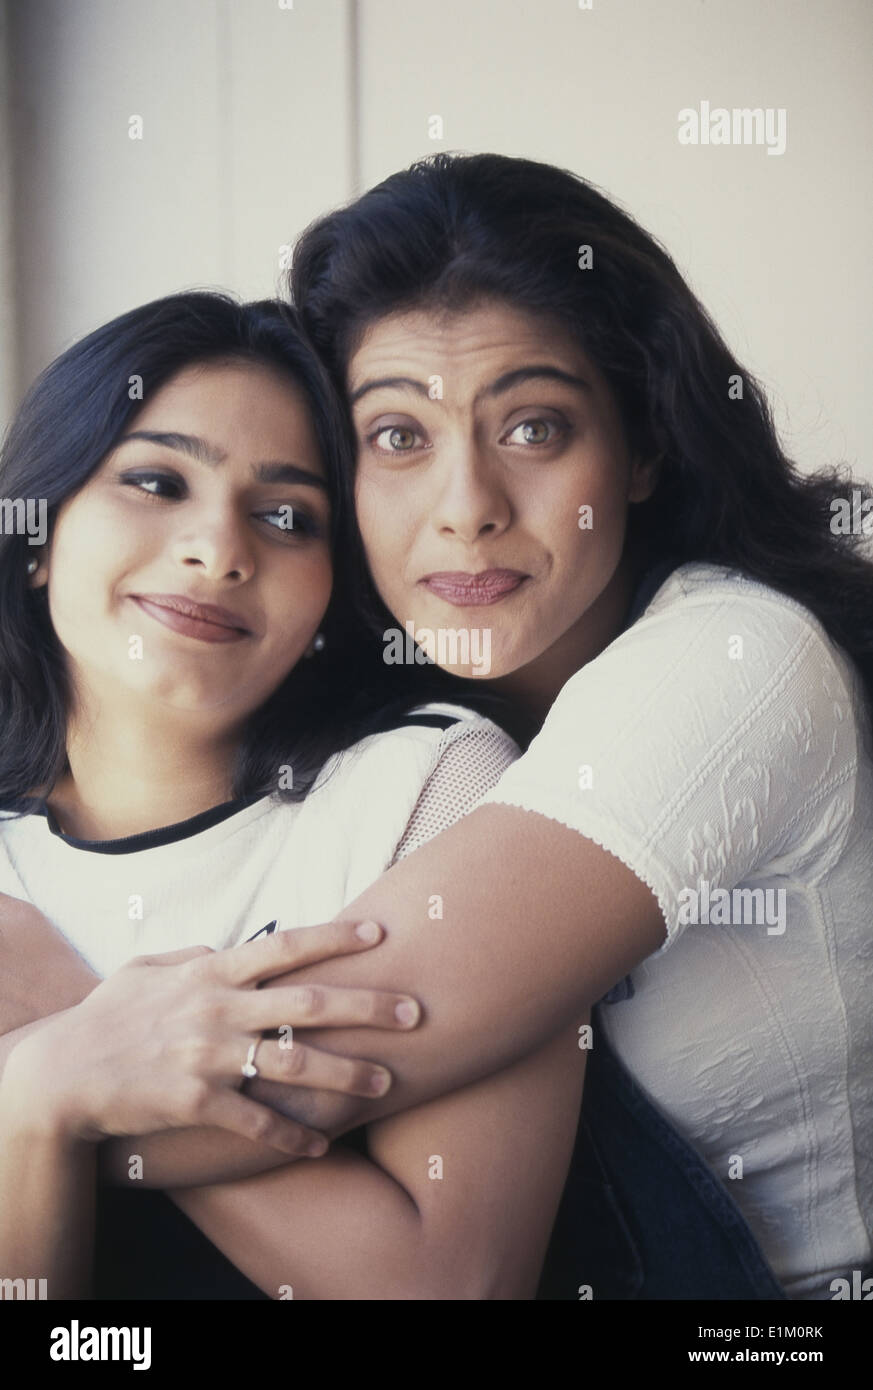 Indian Film Actress Kajol Devgan High Resolution Stock Photography and Images - Alamy